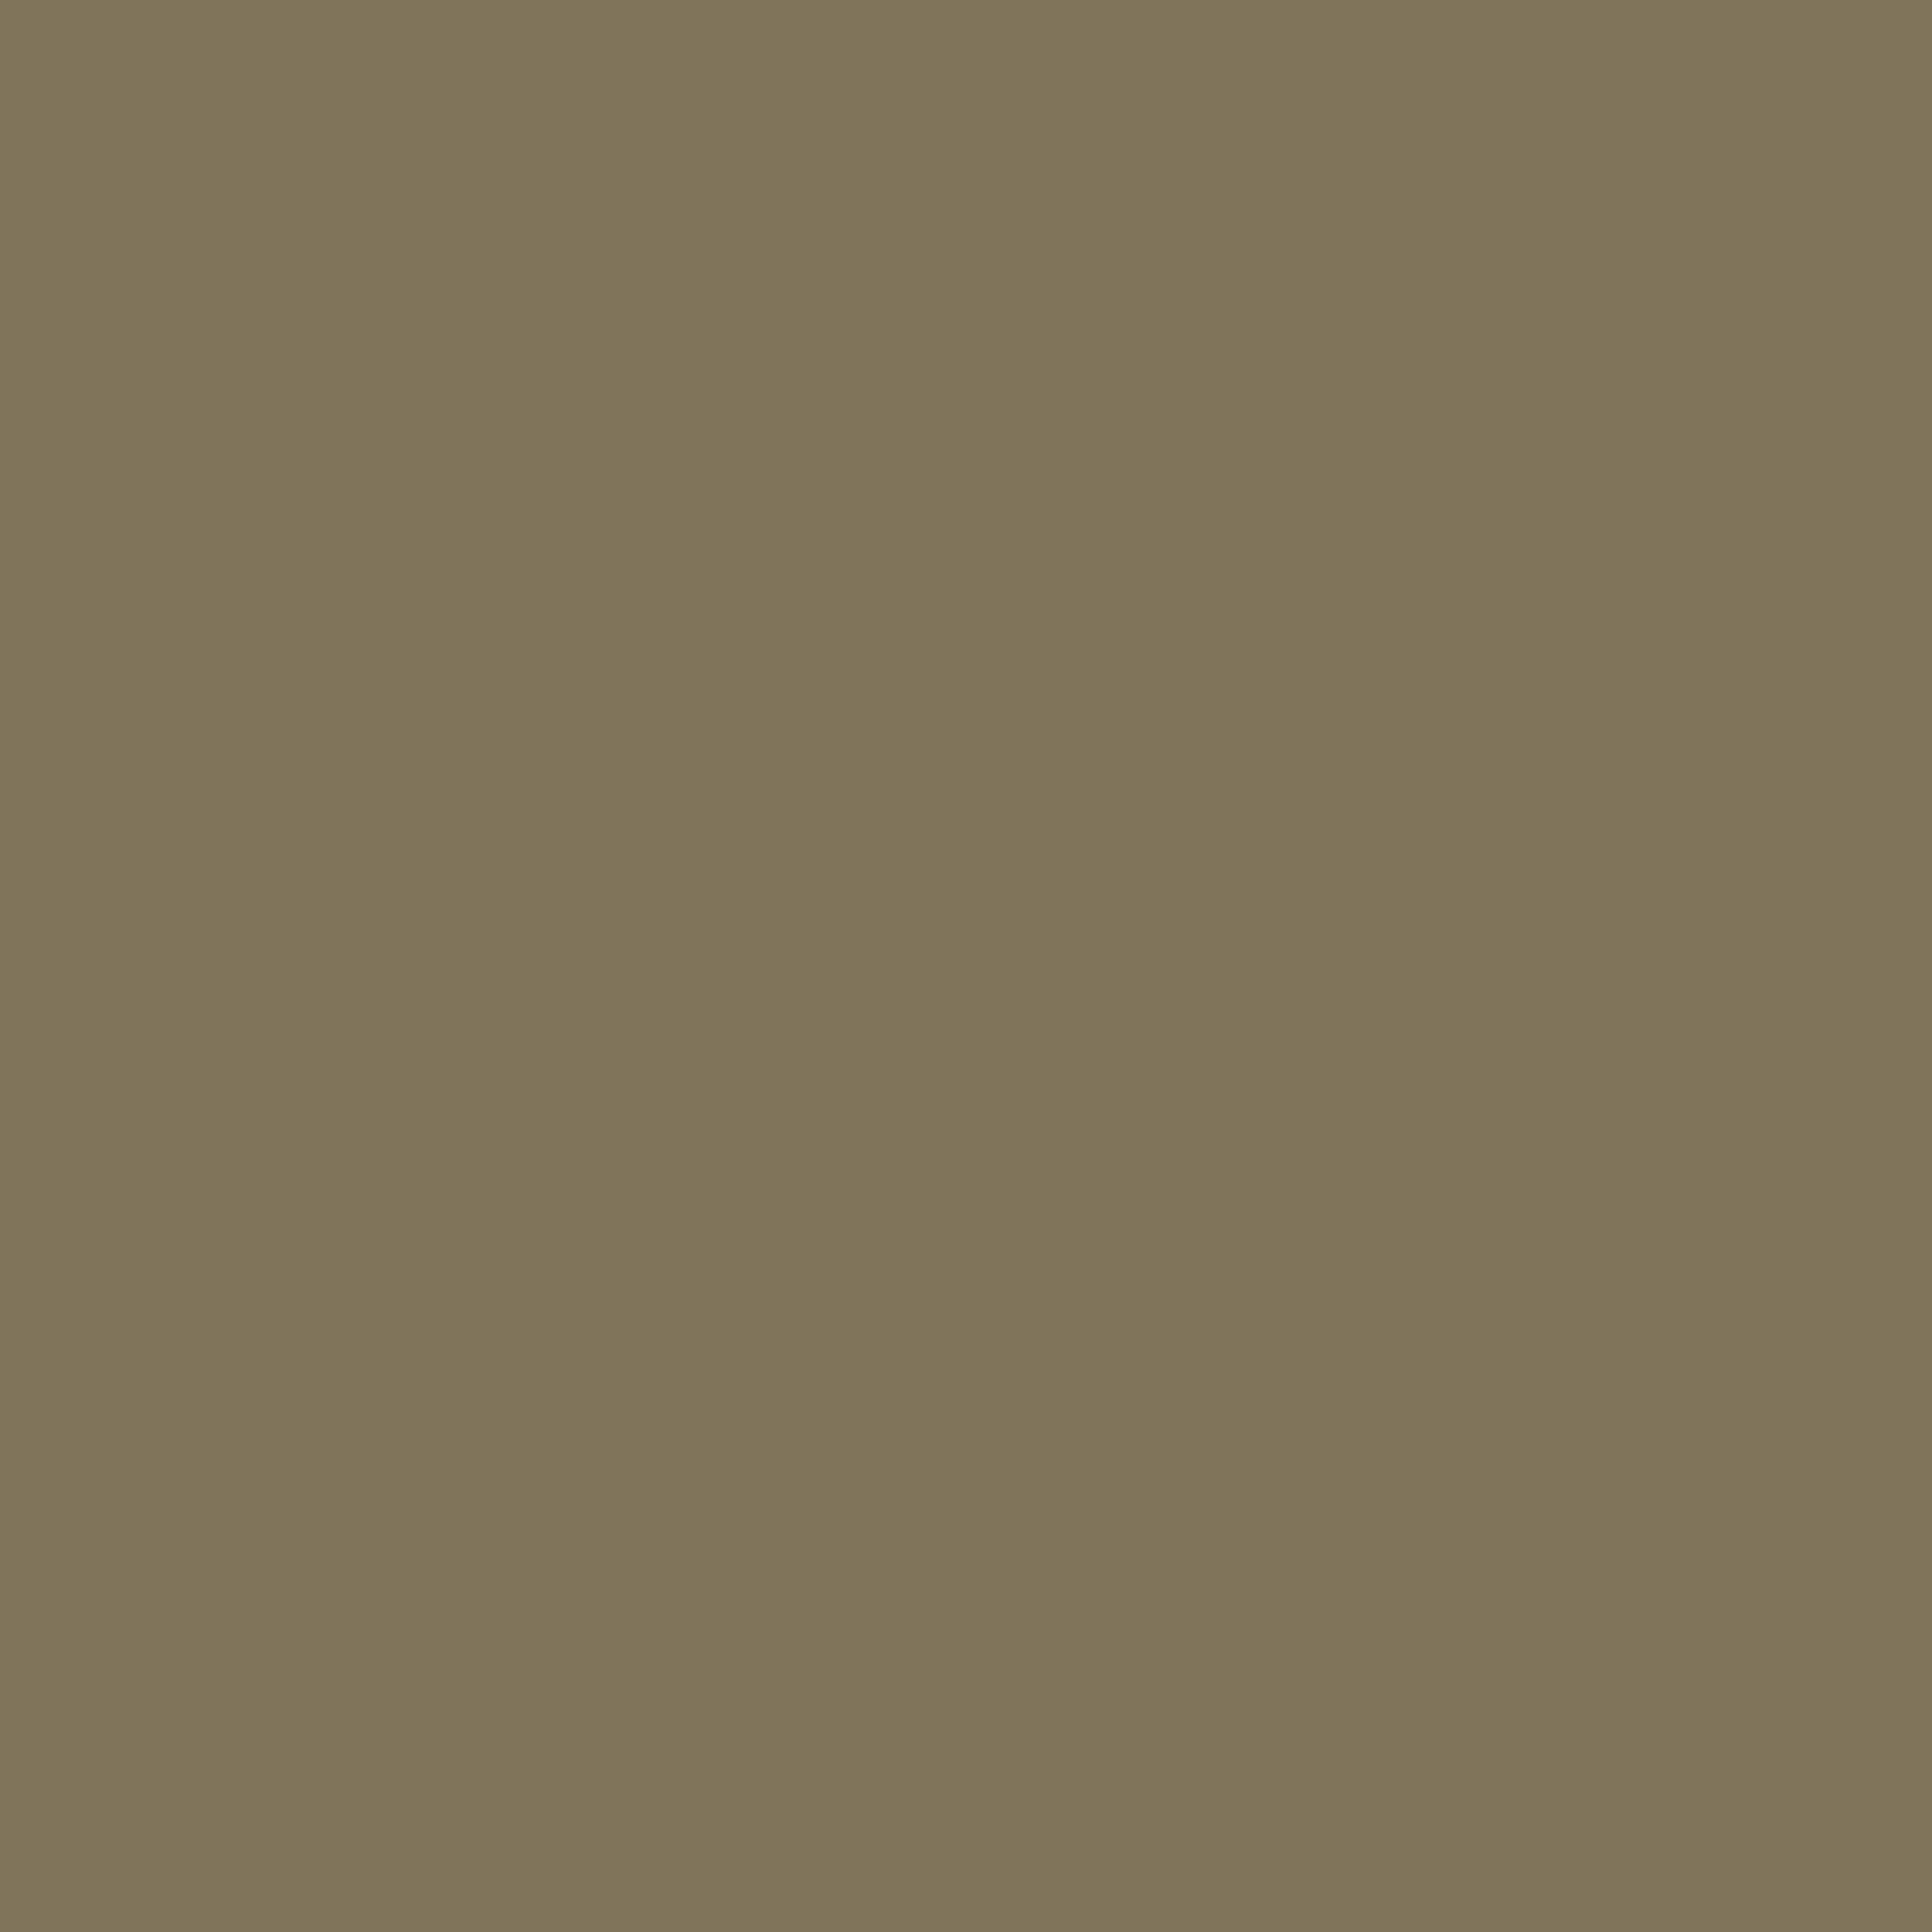 2732x2732 Spanish Bistre Solid Color Background